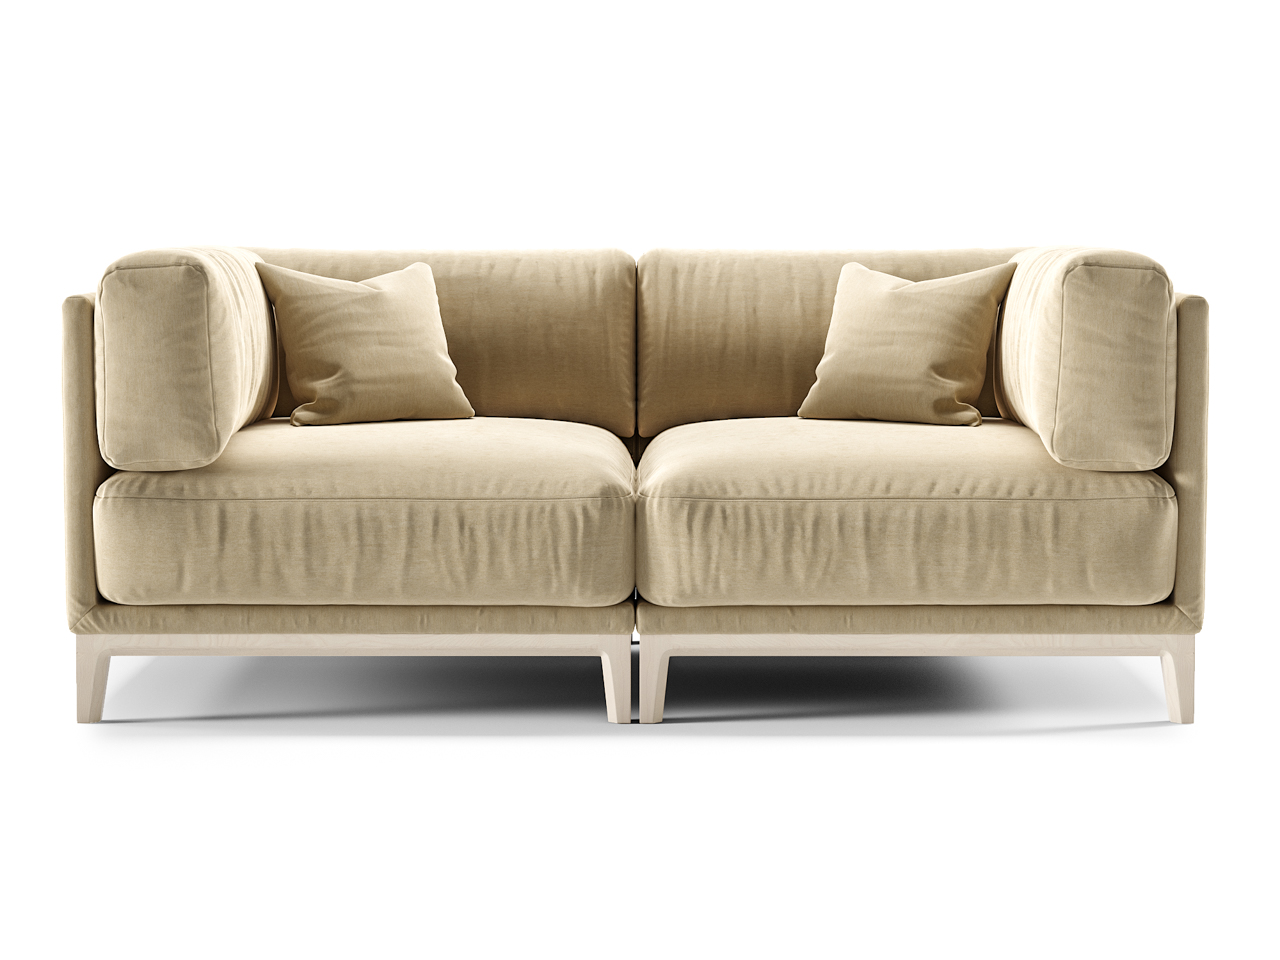 The idea диван case бежевый 108259/4